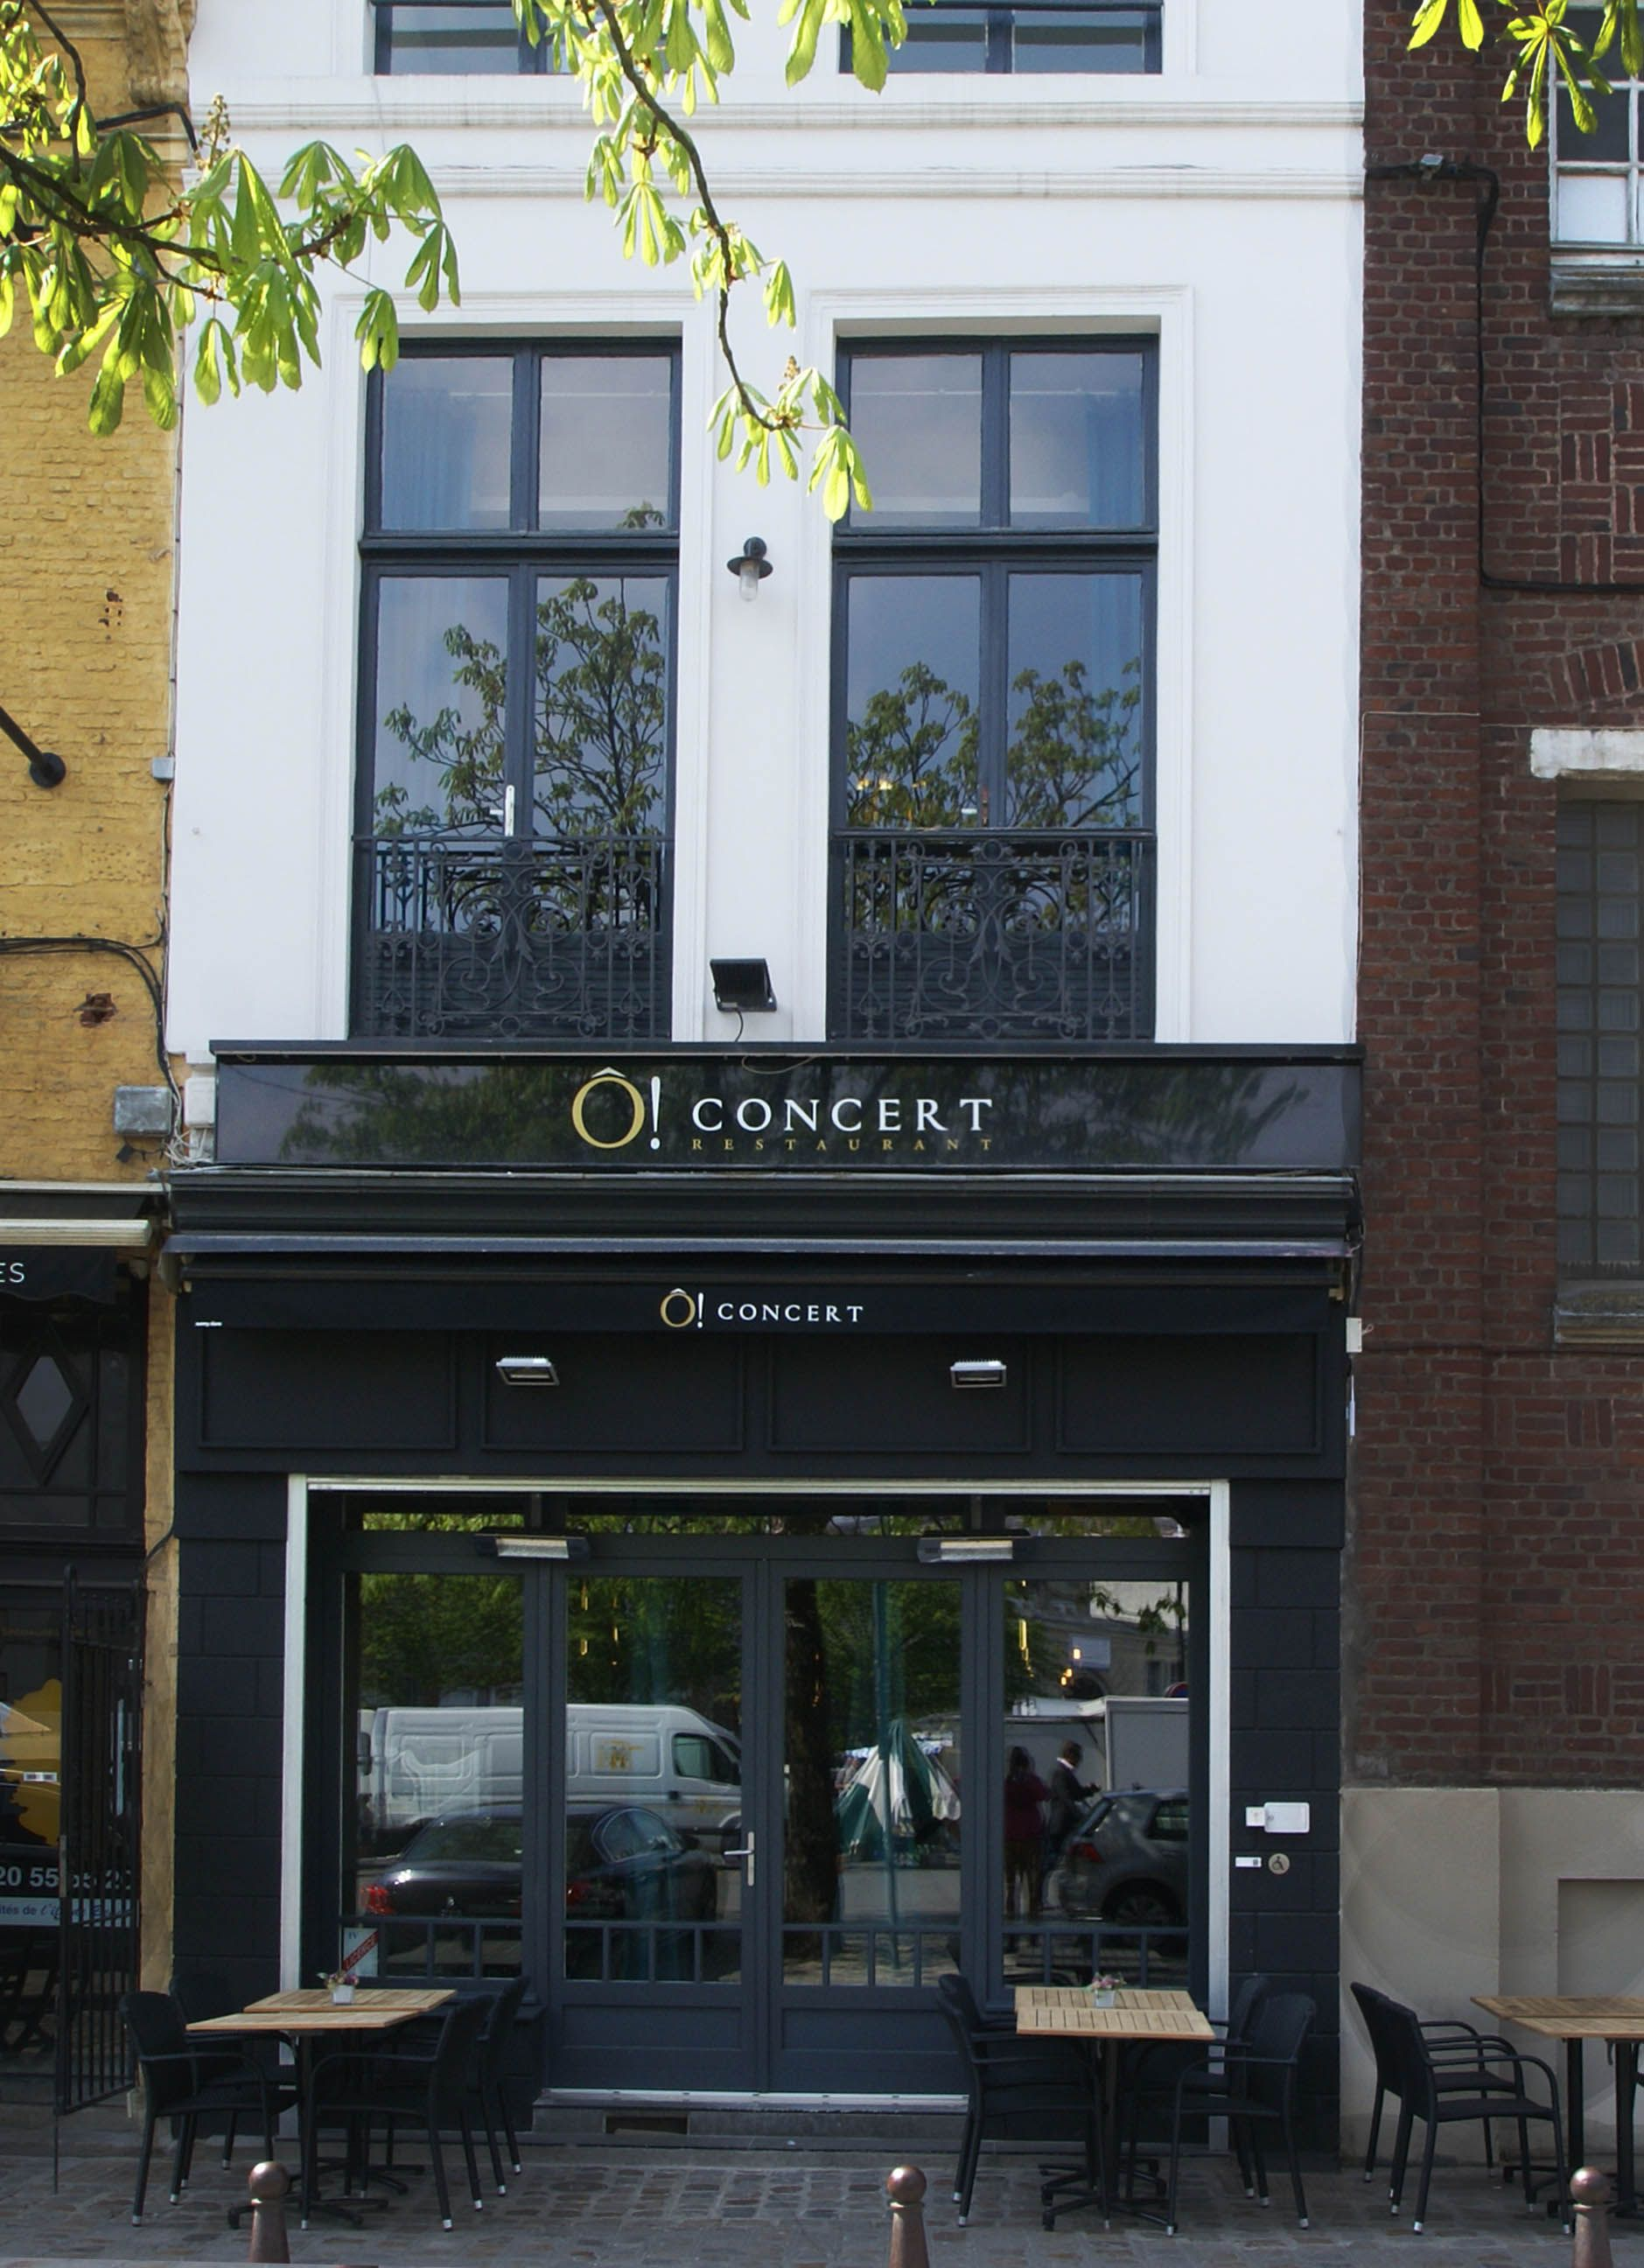 O Concert Lille restaurant Ô! concert à lille #lille #restaurant #bleu #or www